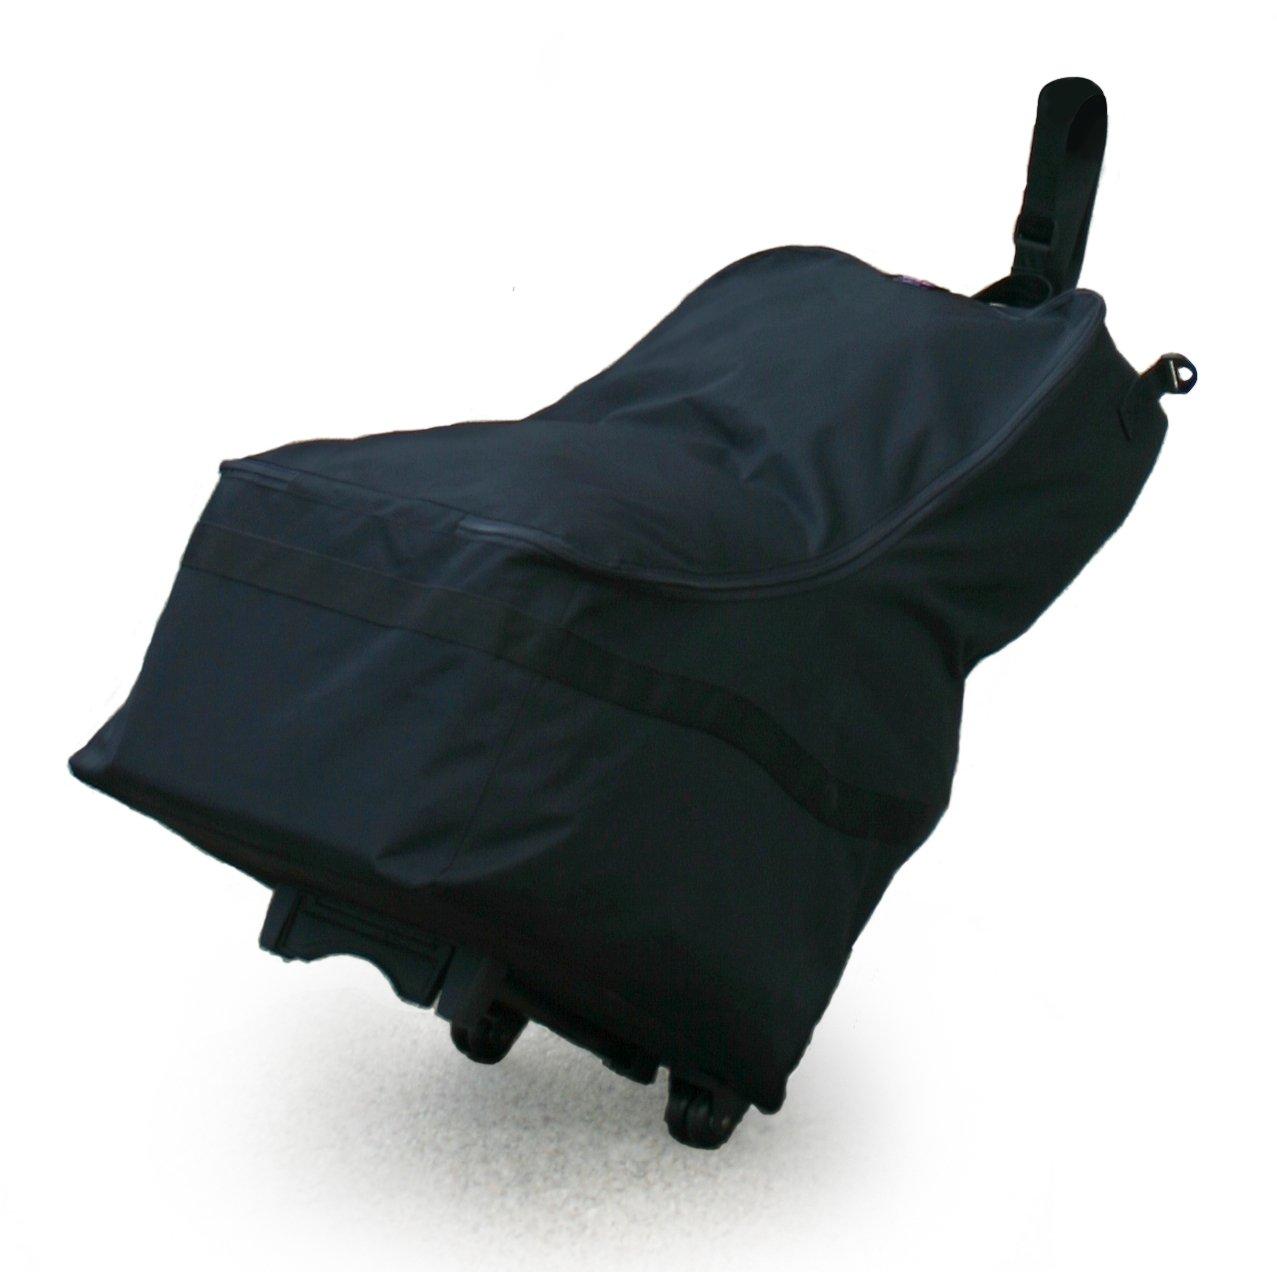 Amazon.com : JL Childress Standard and Dual Stroller